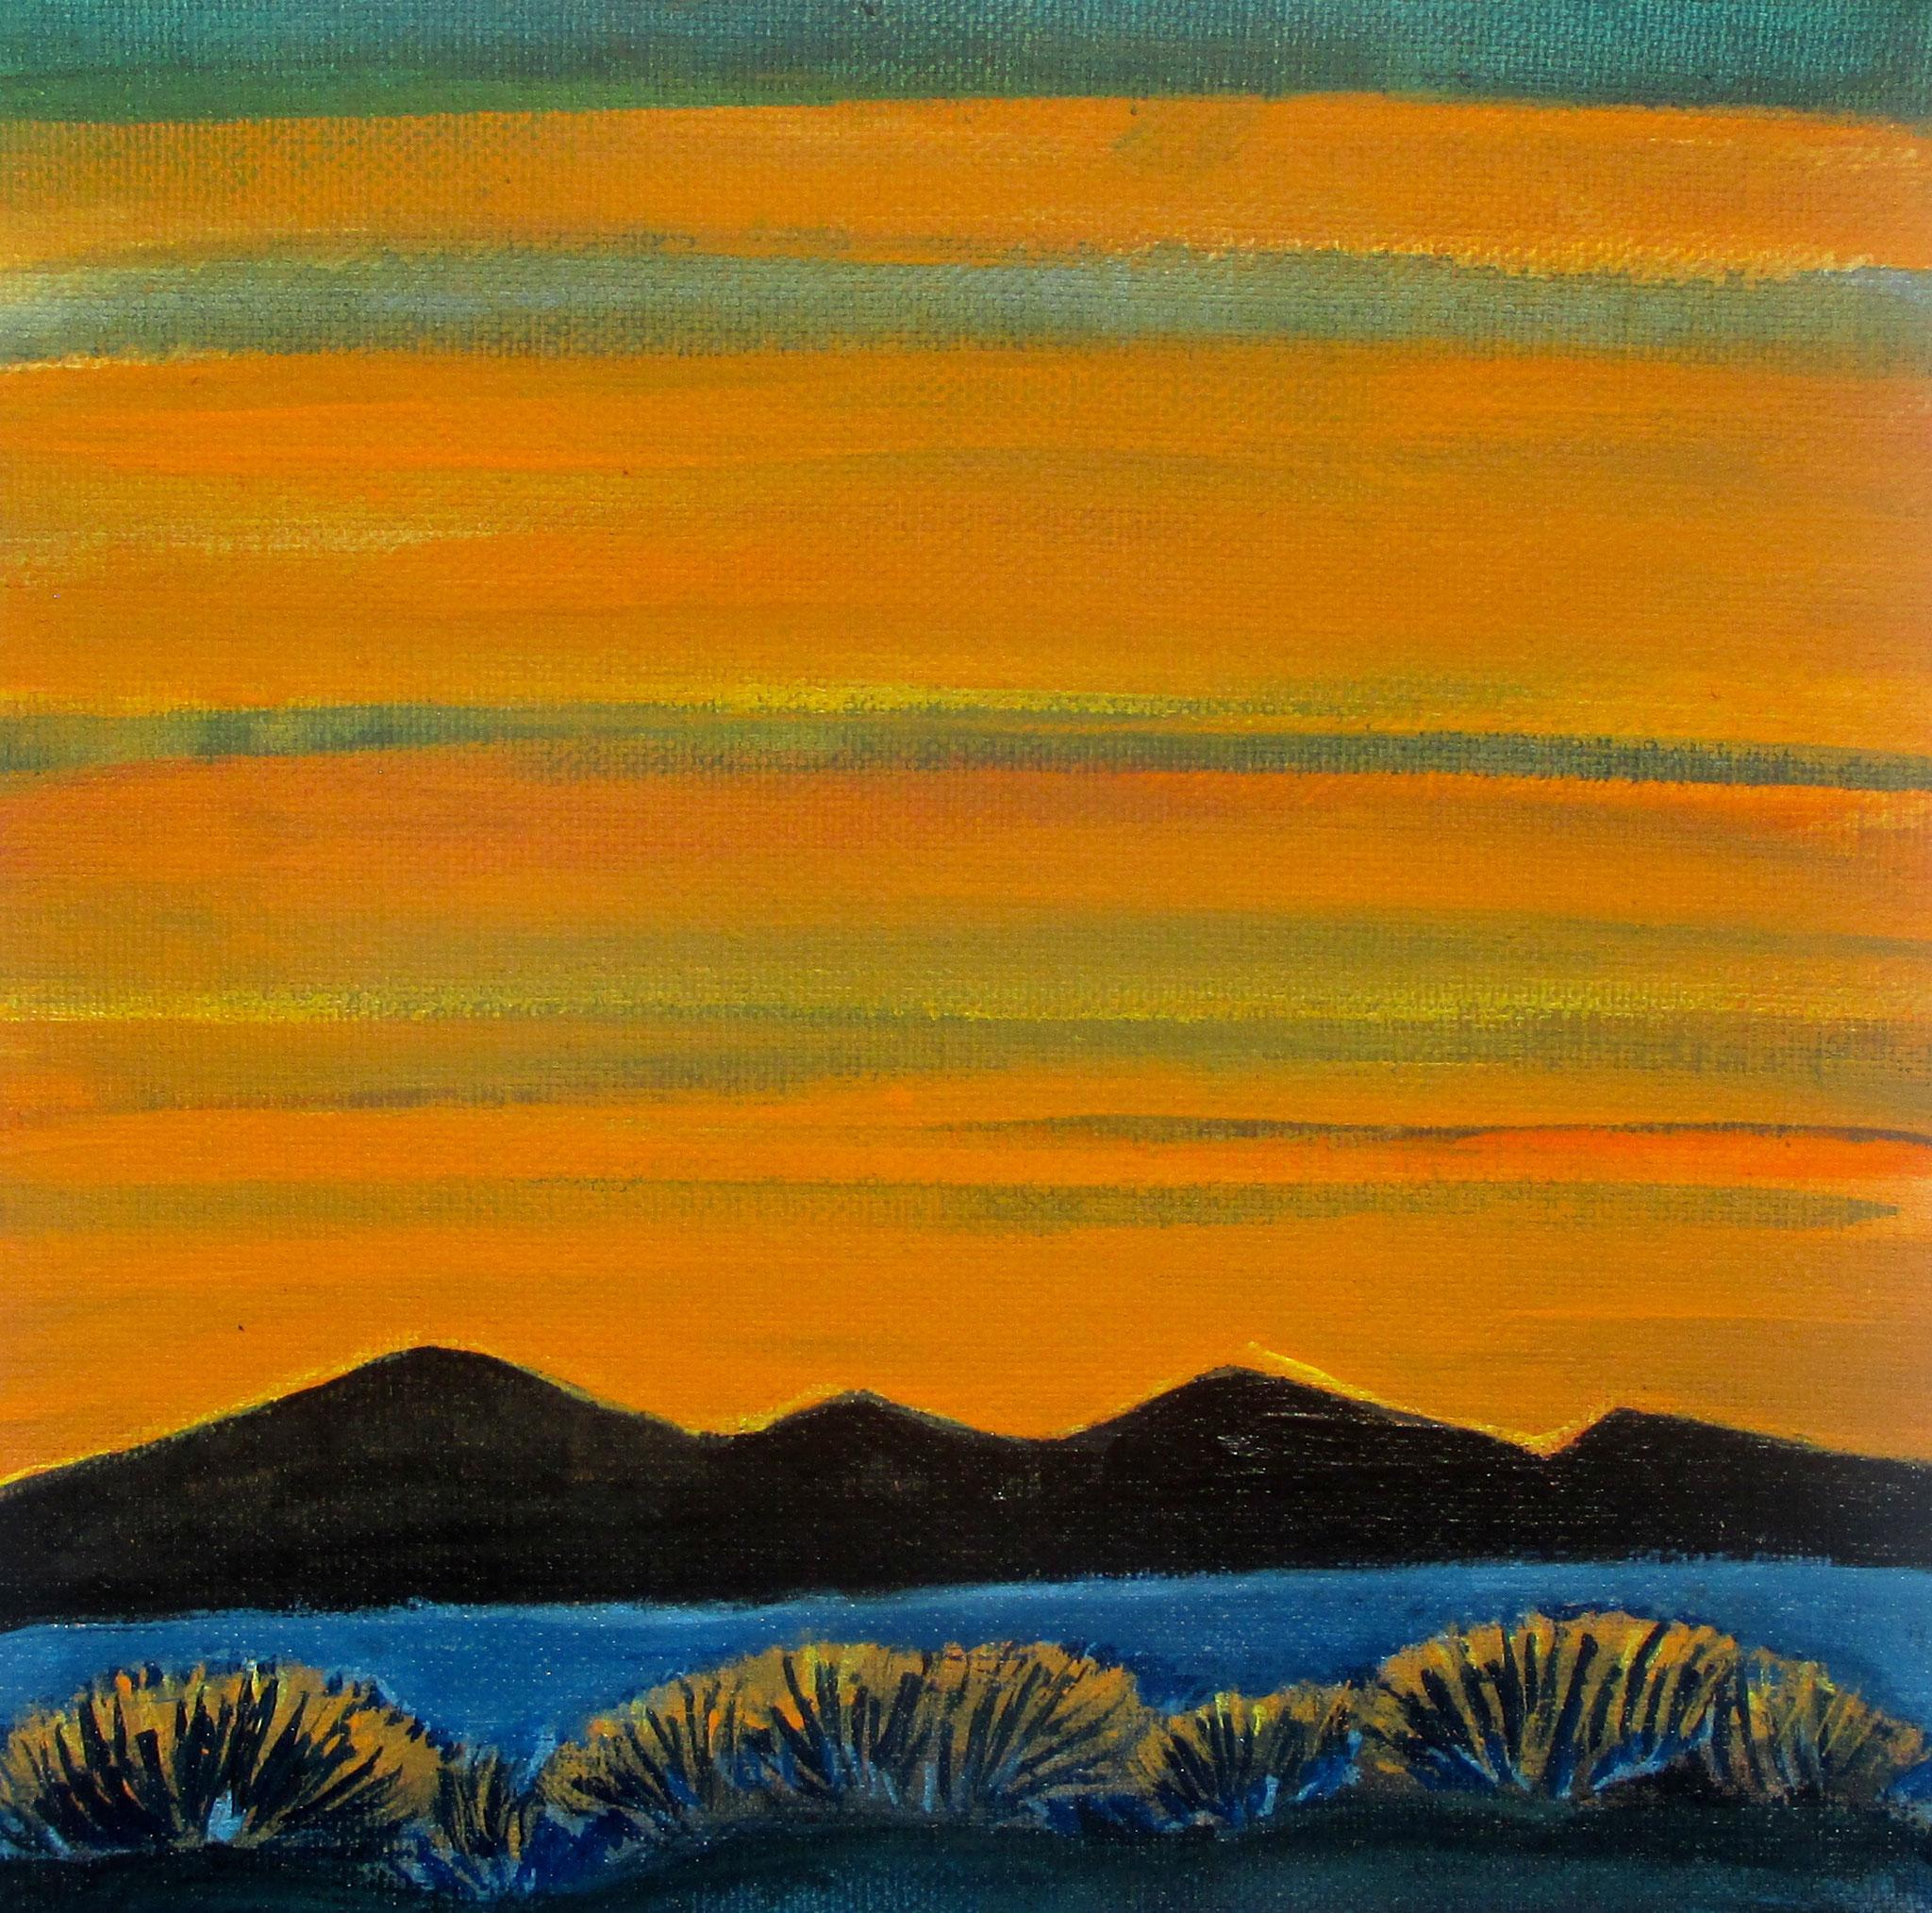 Golden Sunset, acrylic on canvas, 12 x 12, 2019